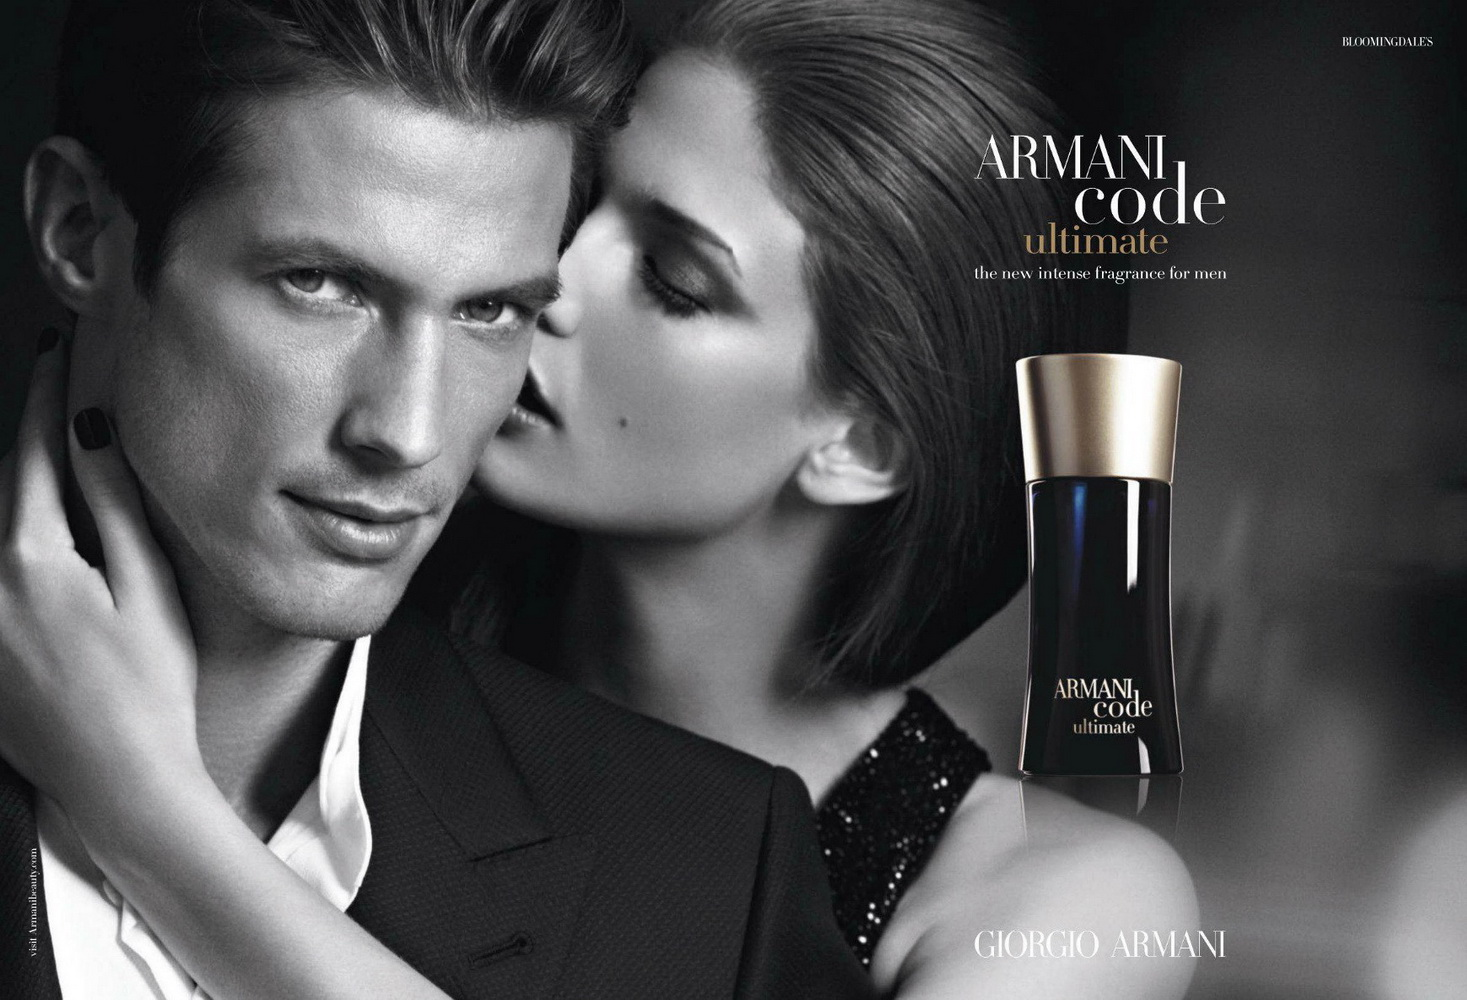 Armani Code Ultimate Giorgio Armani одеколон - аромат для чоловіків 2012 a32dbfd25f44f